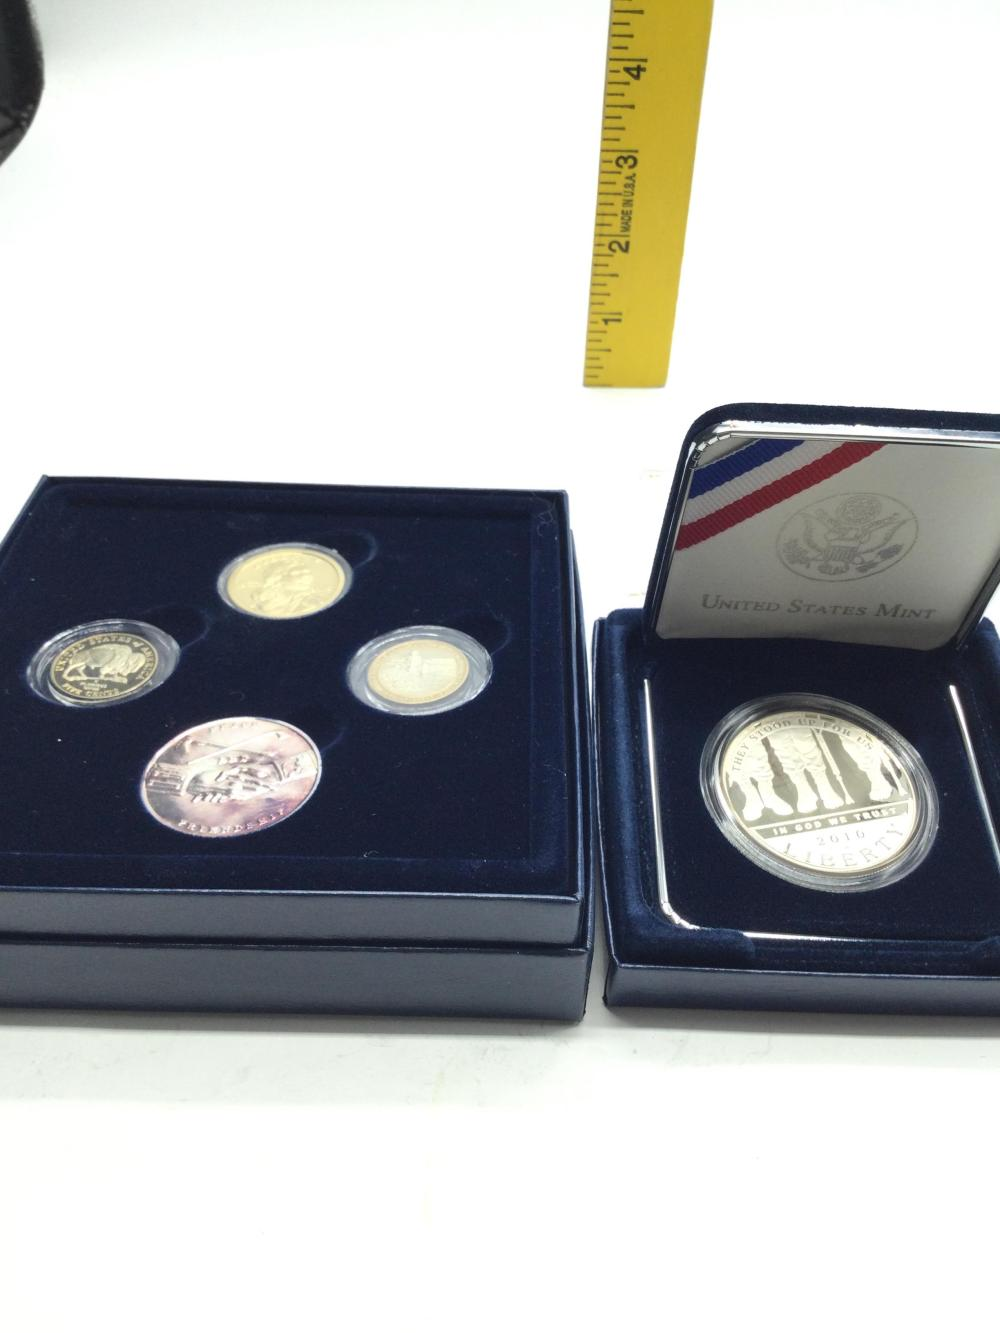 2 Commemorative Coin Sets